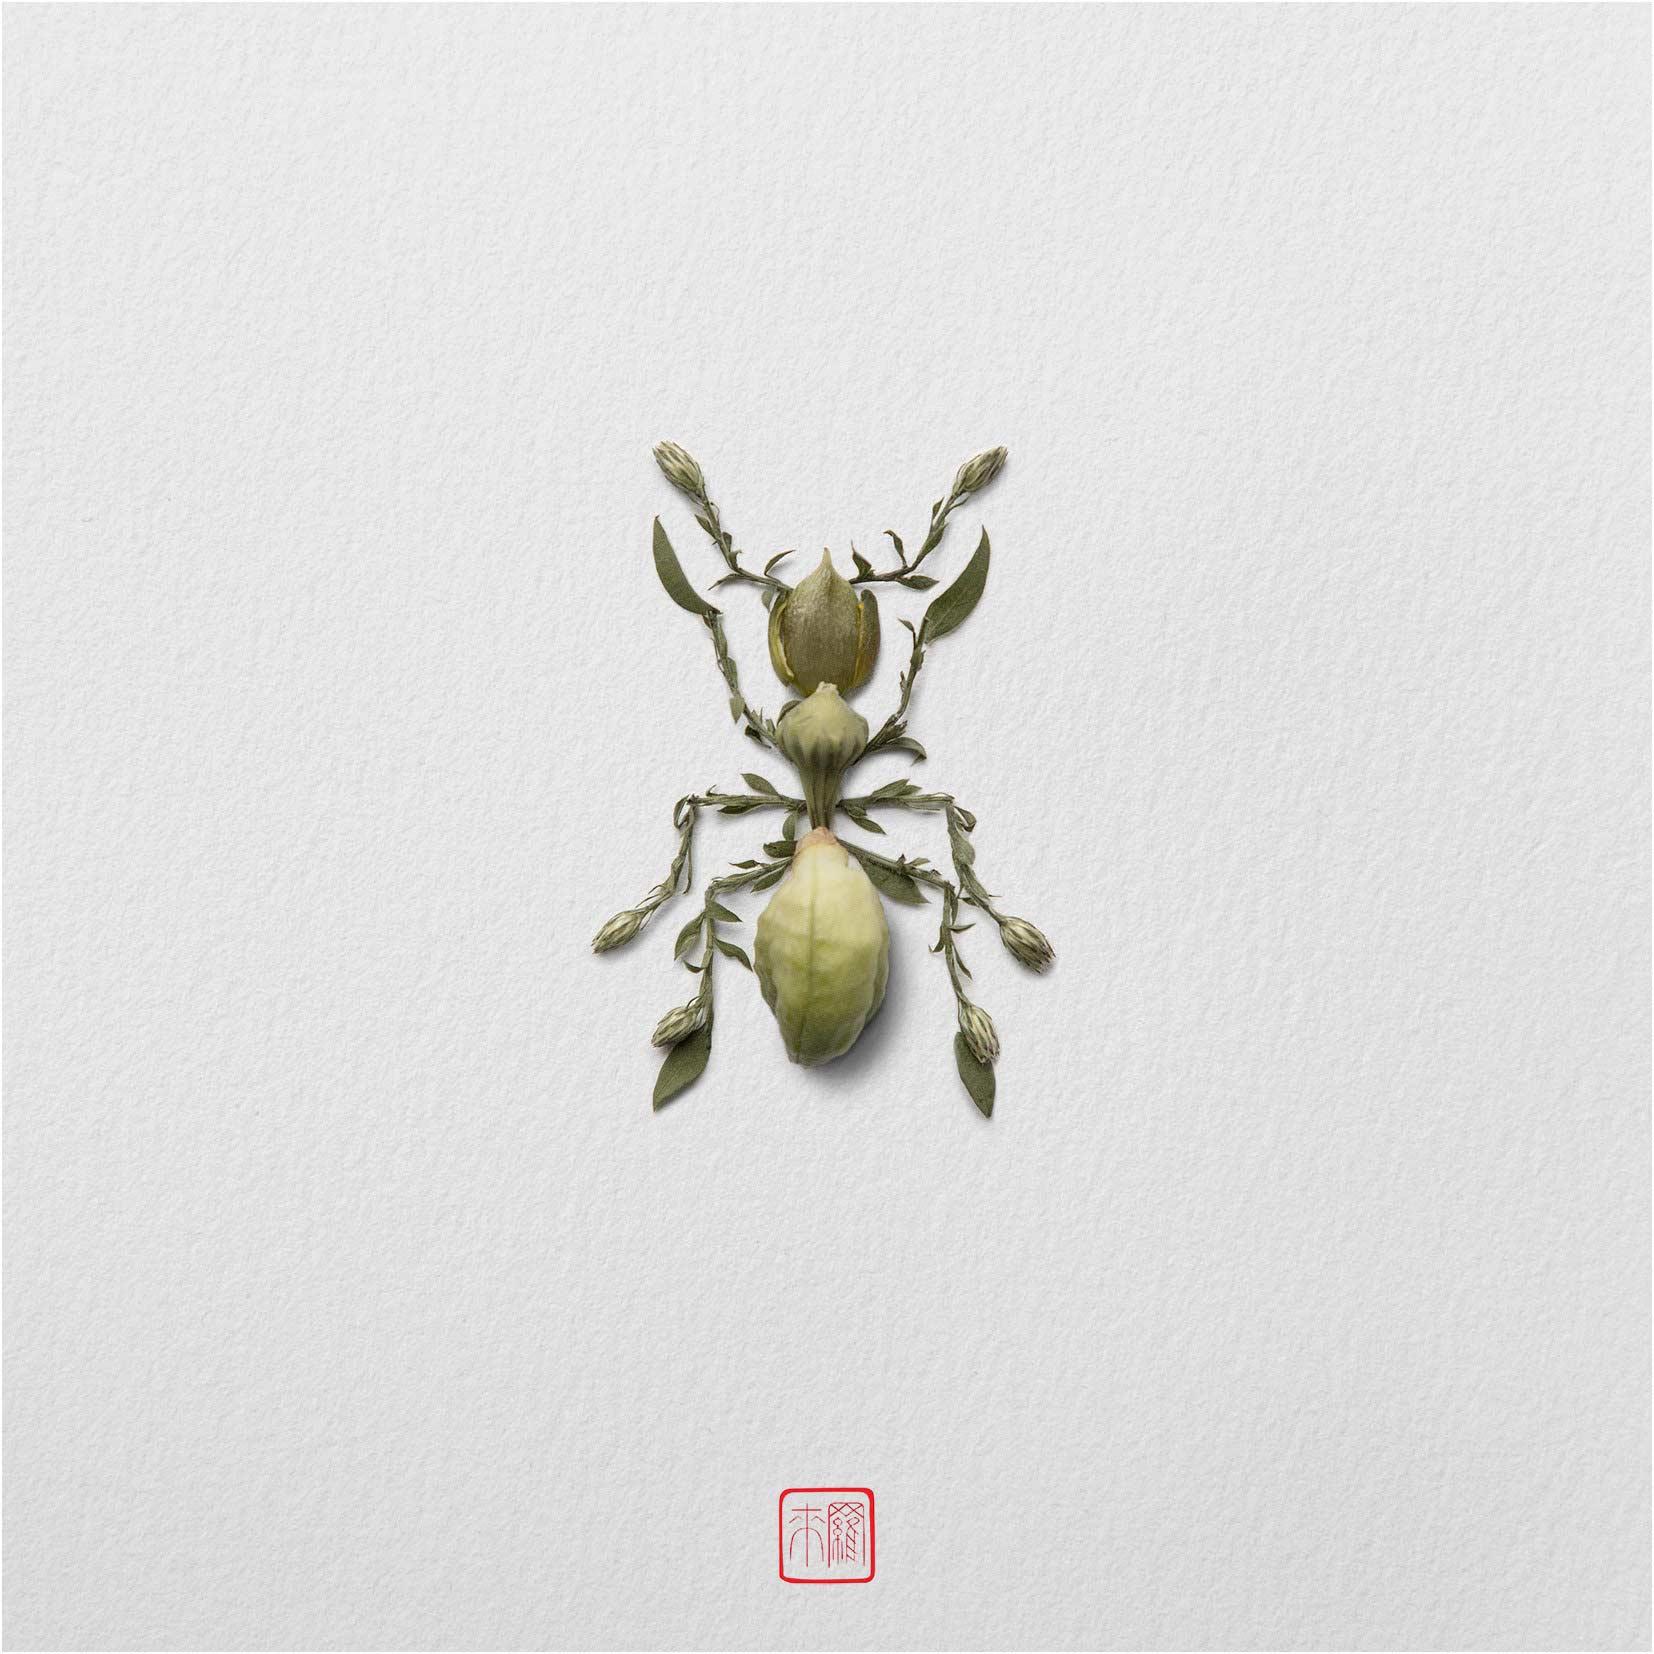 Tiere aus Blumenblüten Tiere-aus-blumenblueten-Raku-Inoue_10